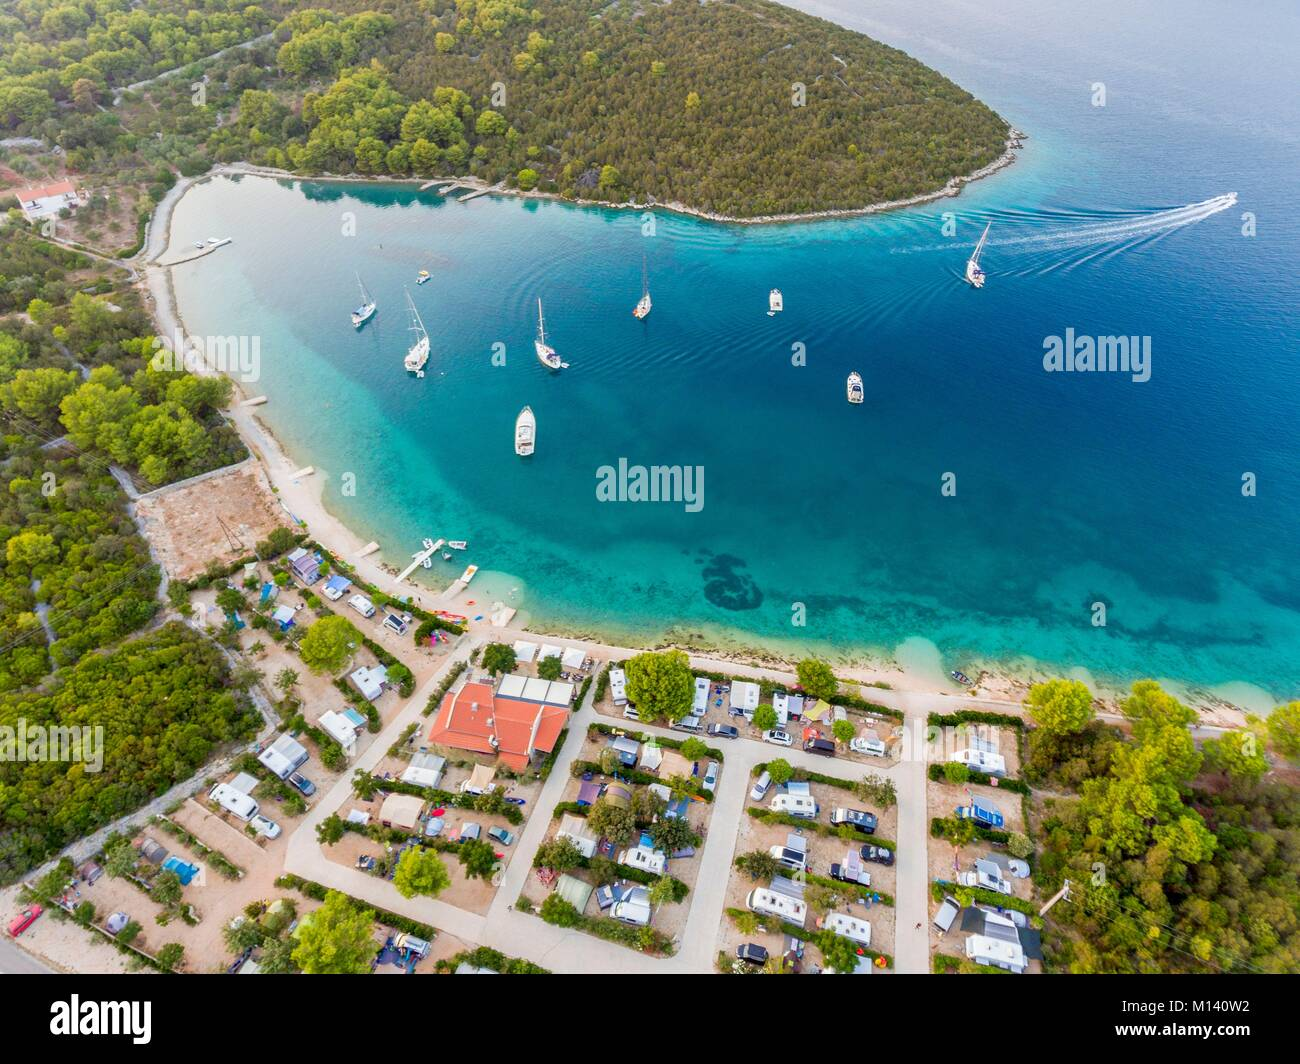 Croatia, North Dalmatia, Dalmatian coast, Zadar archipelago, Dugi Otok Island, camping Verunic (aerial view) - Stock Image